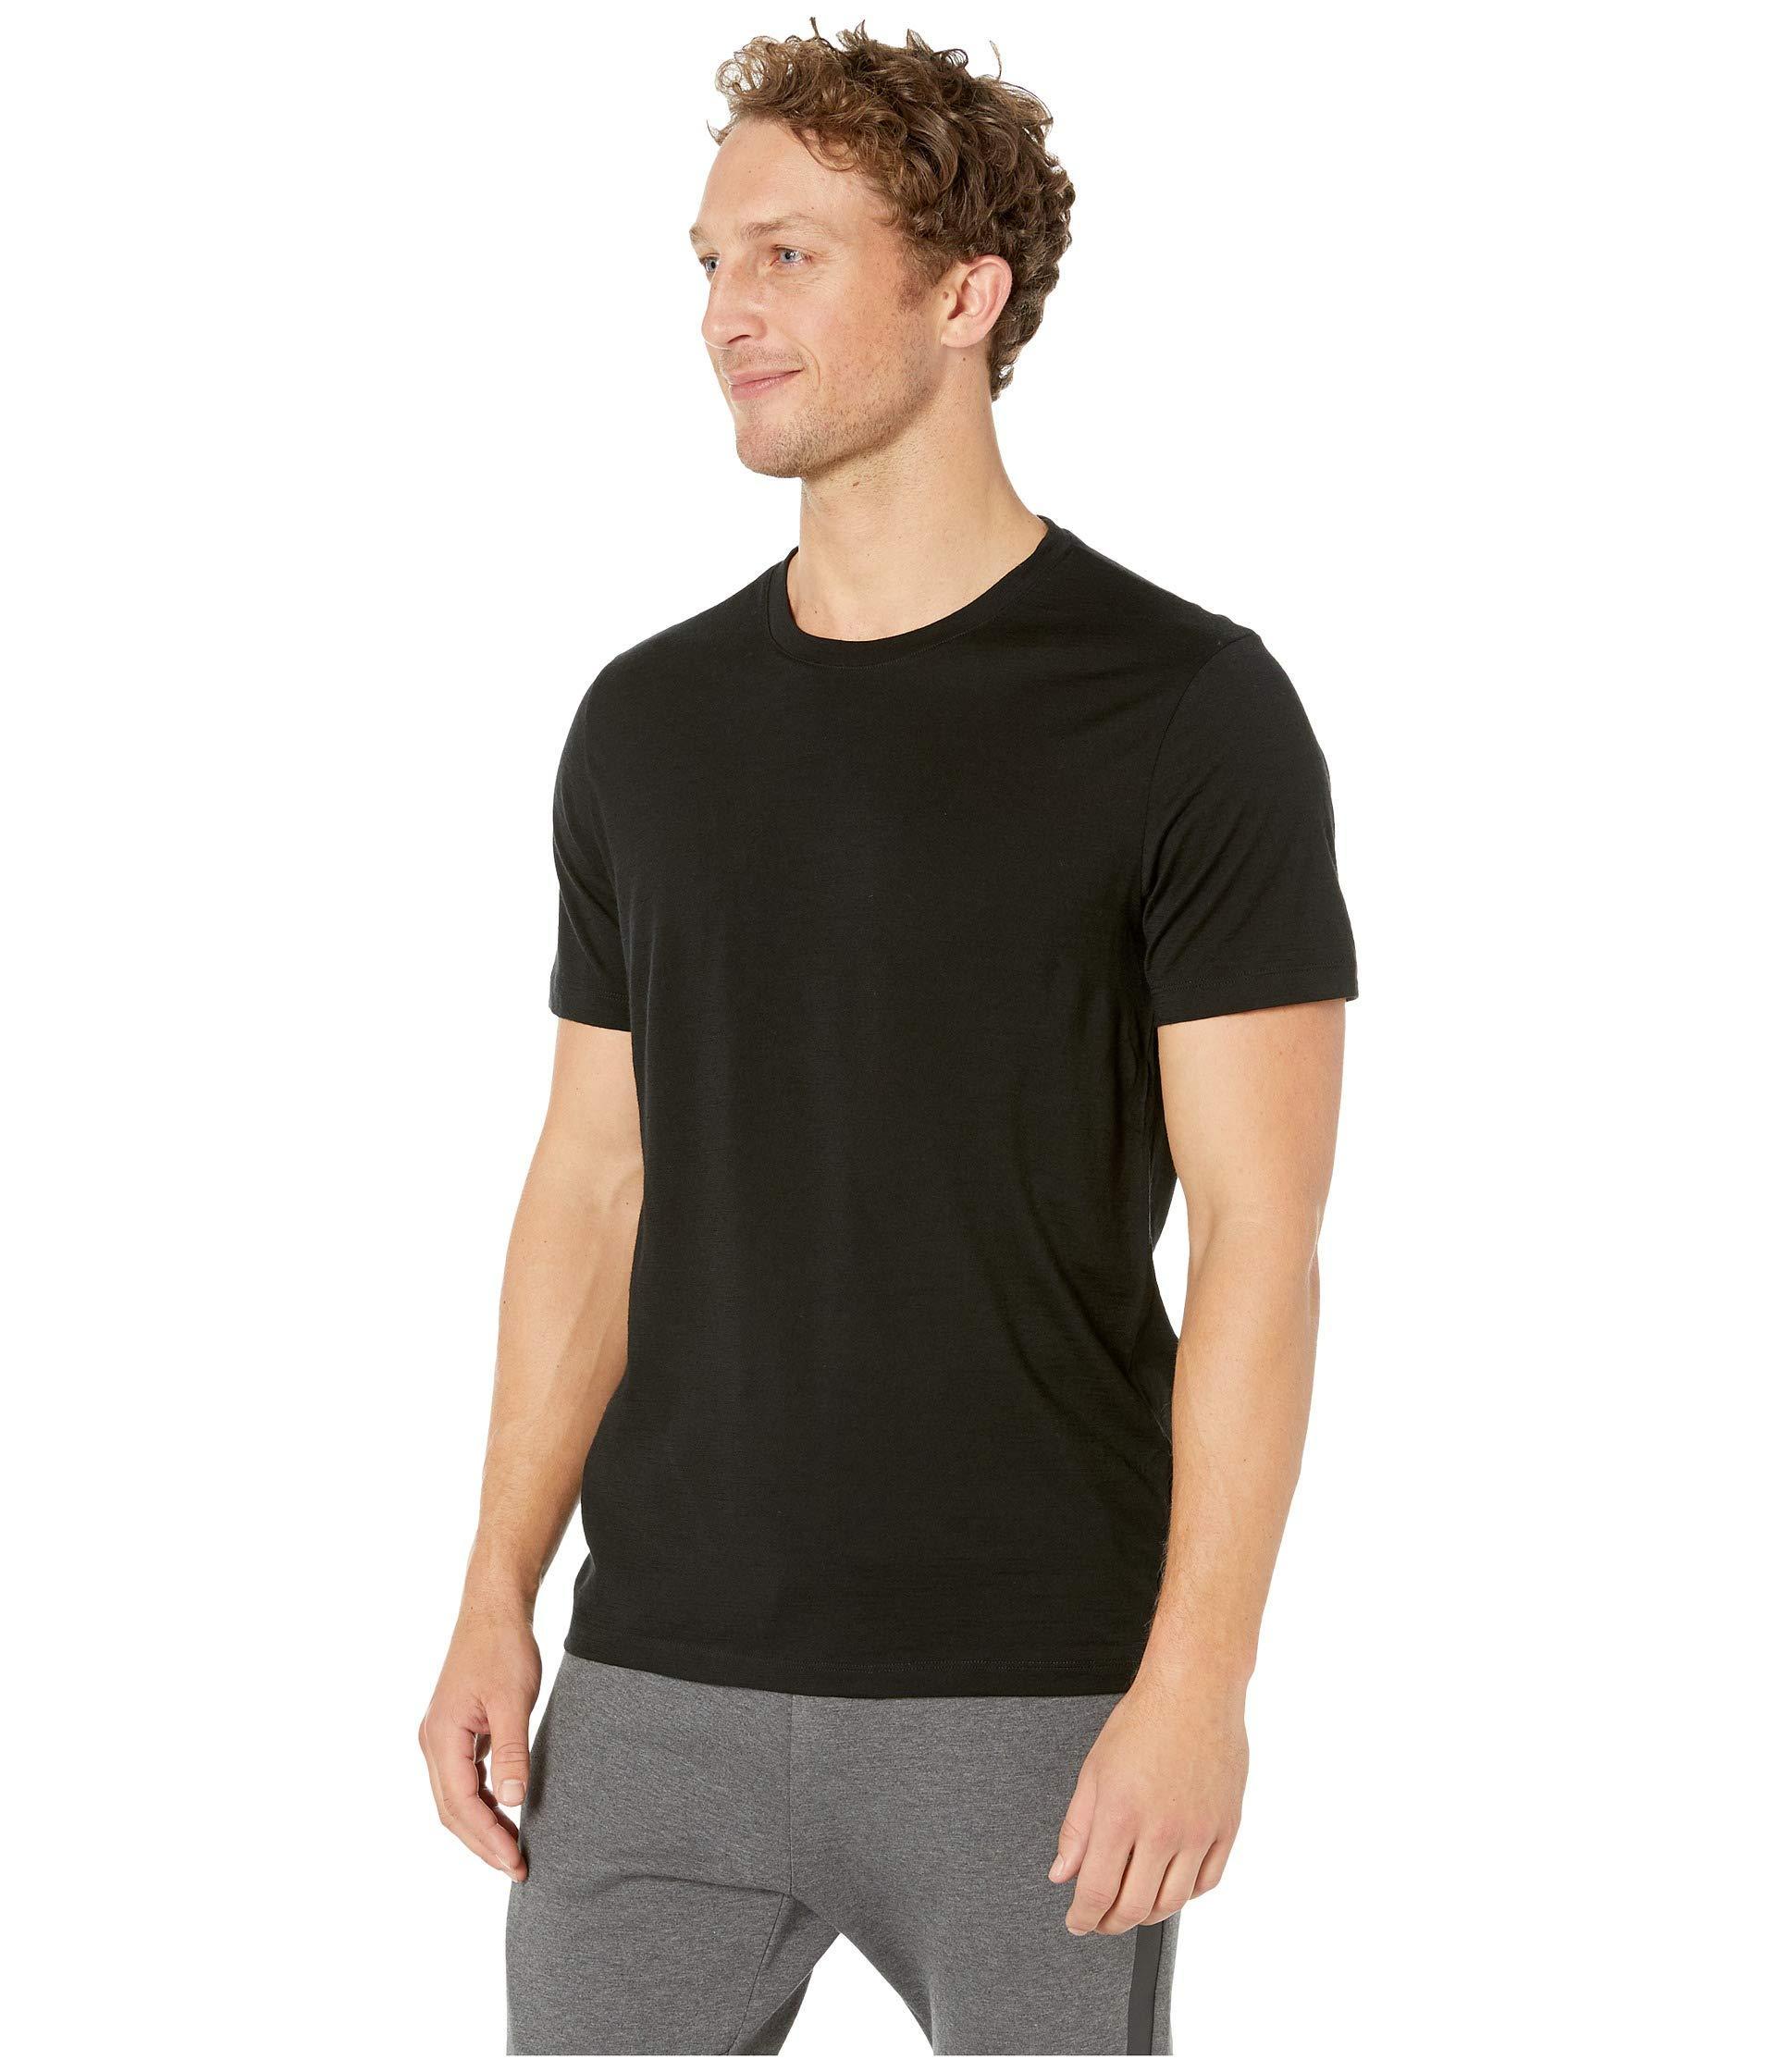 078b73db Lyst - Icebreaker Tech Lite Short Sleeve Crewe (gritstone Heather 1) Men's  Clothing in Black for Men